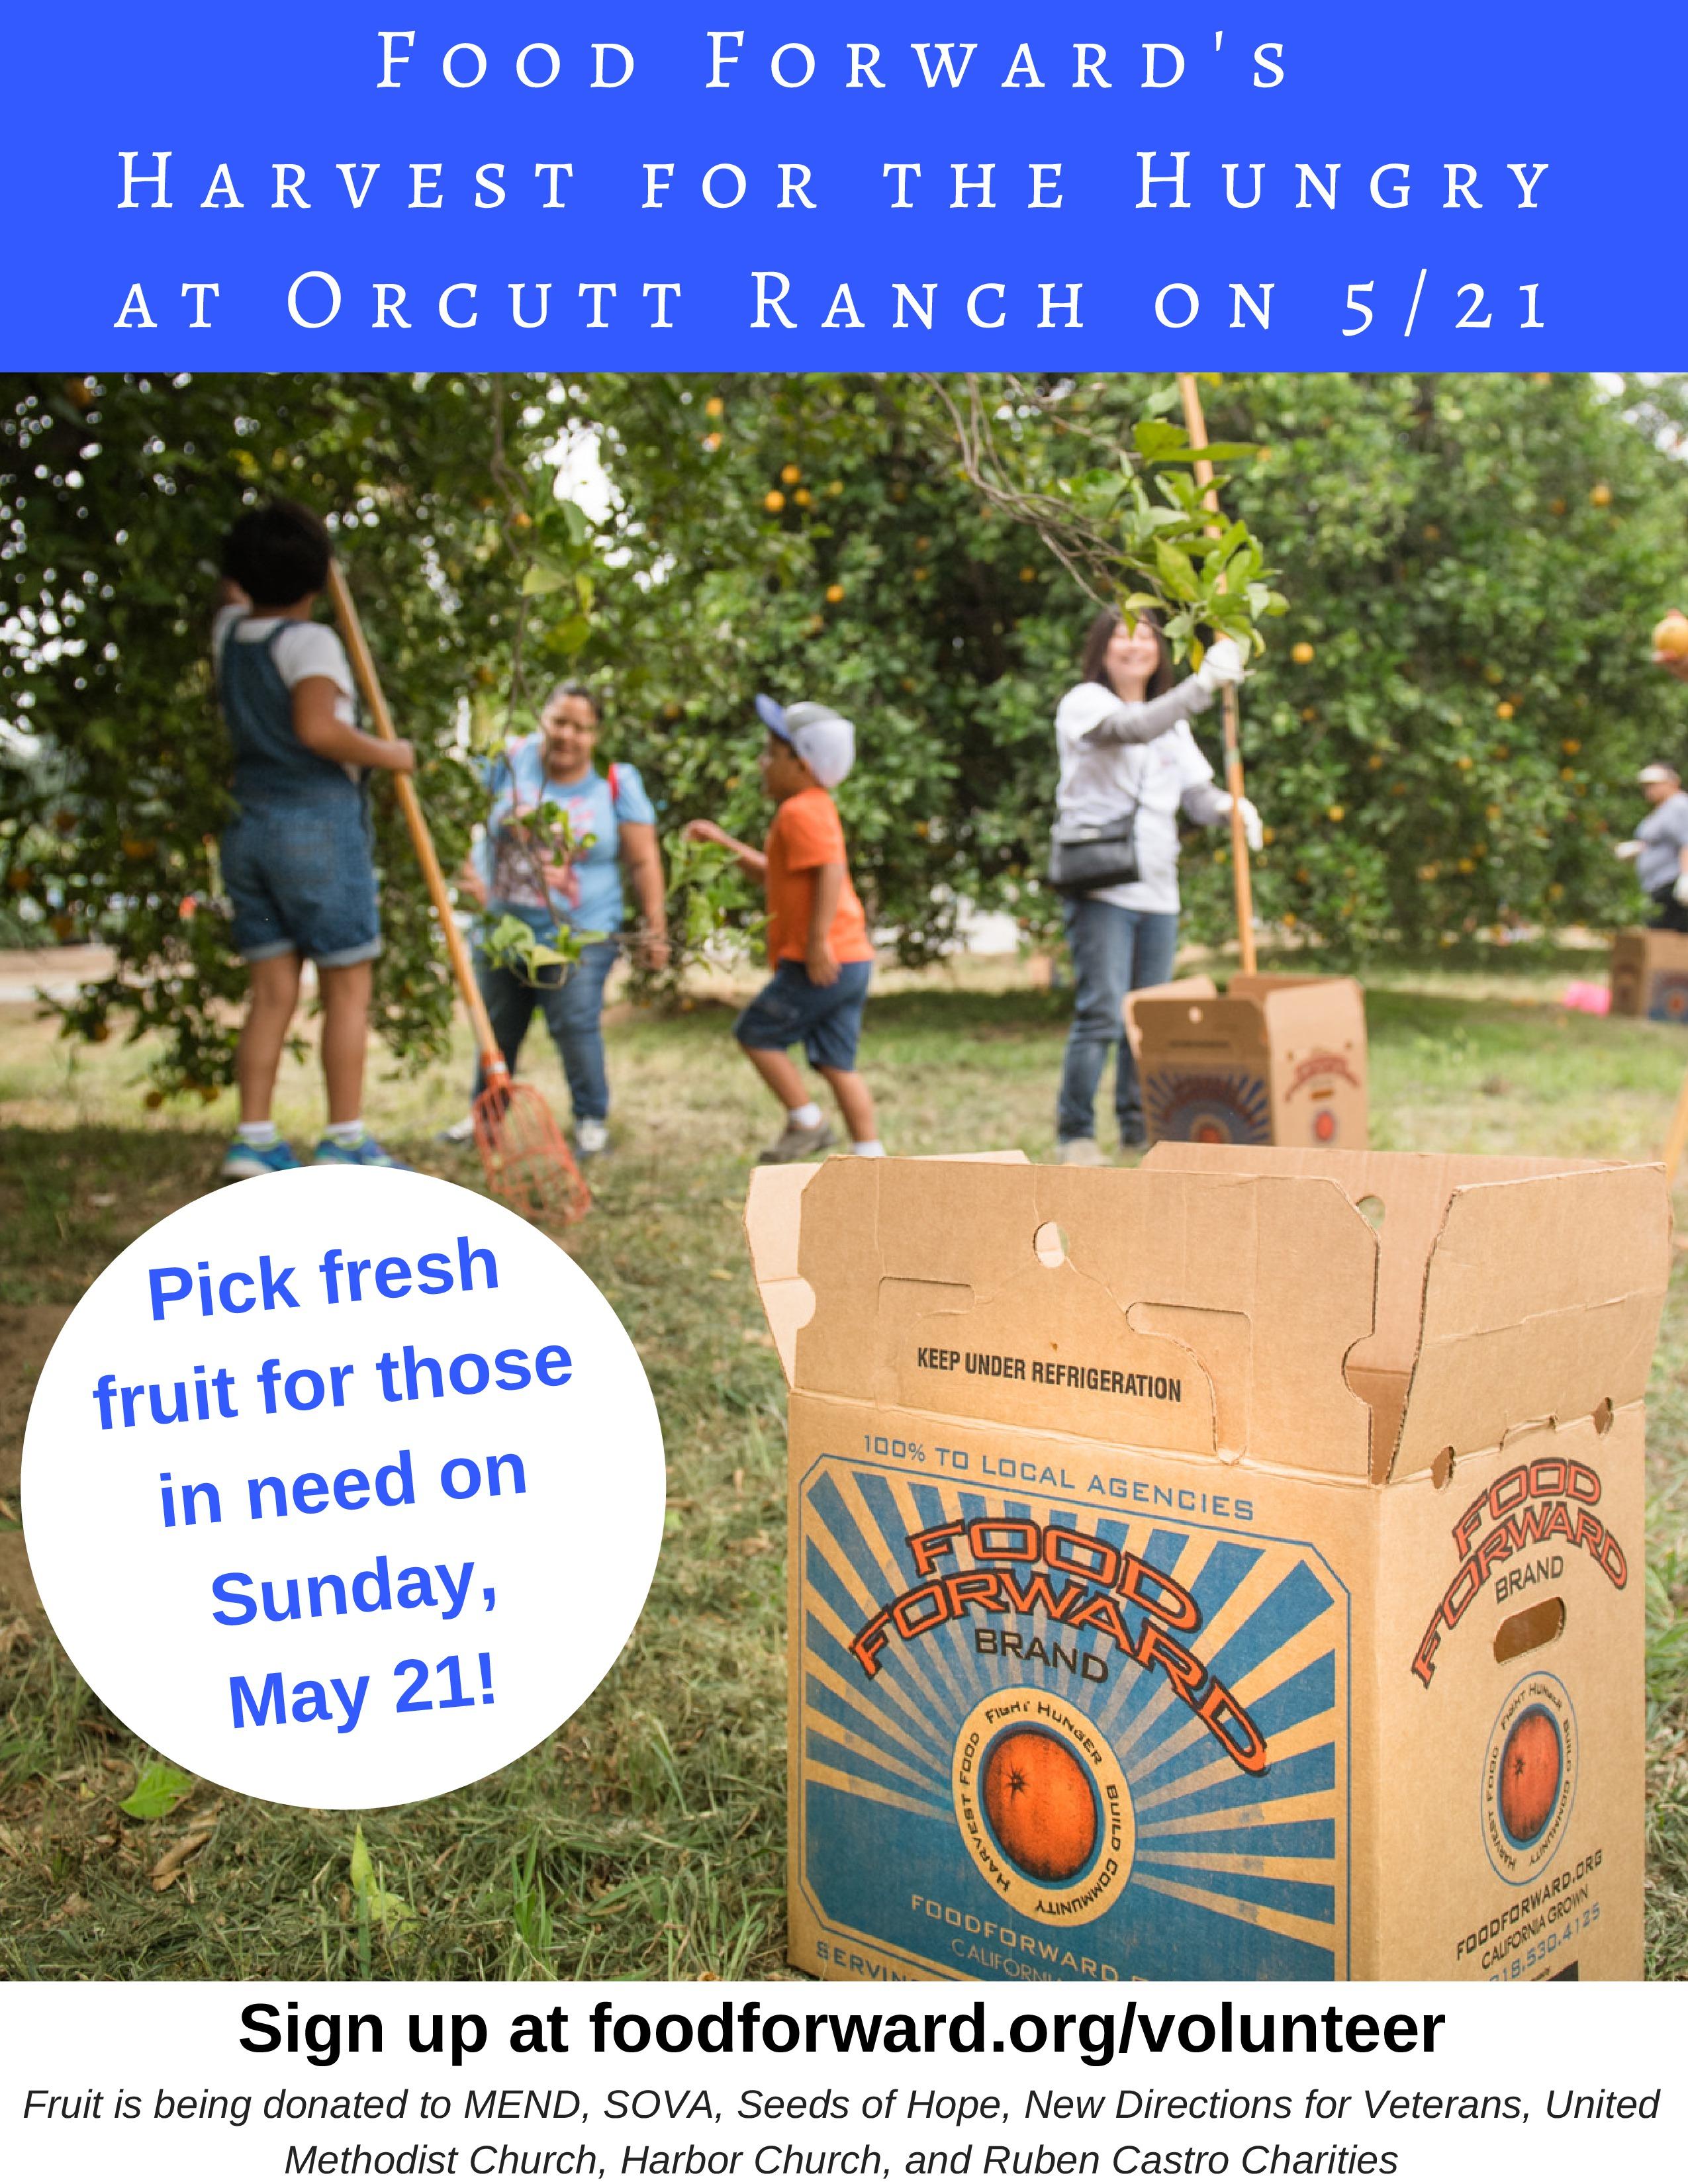 Food_Forward_-_Orcutt_Ranch-page-0.jpg